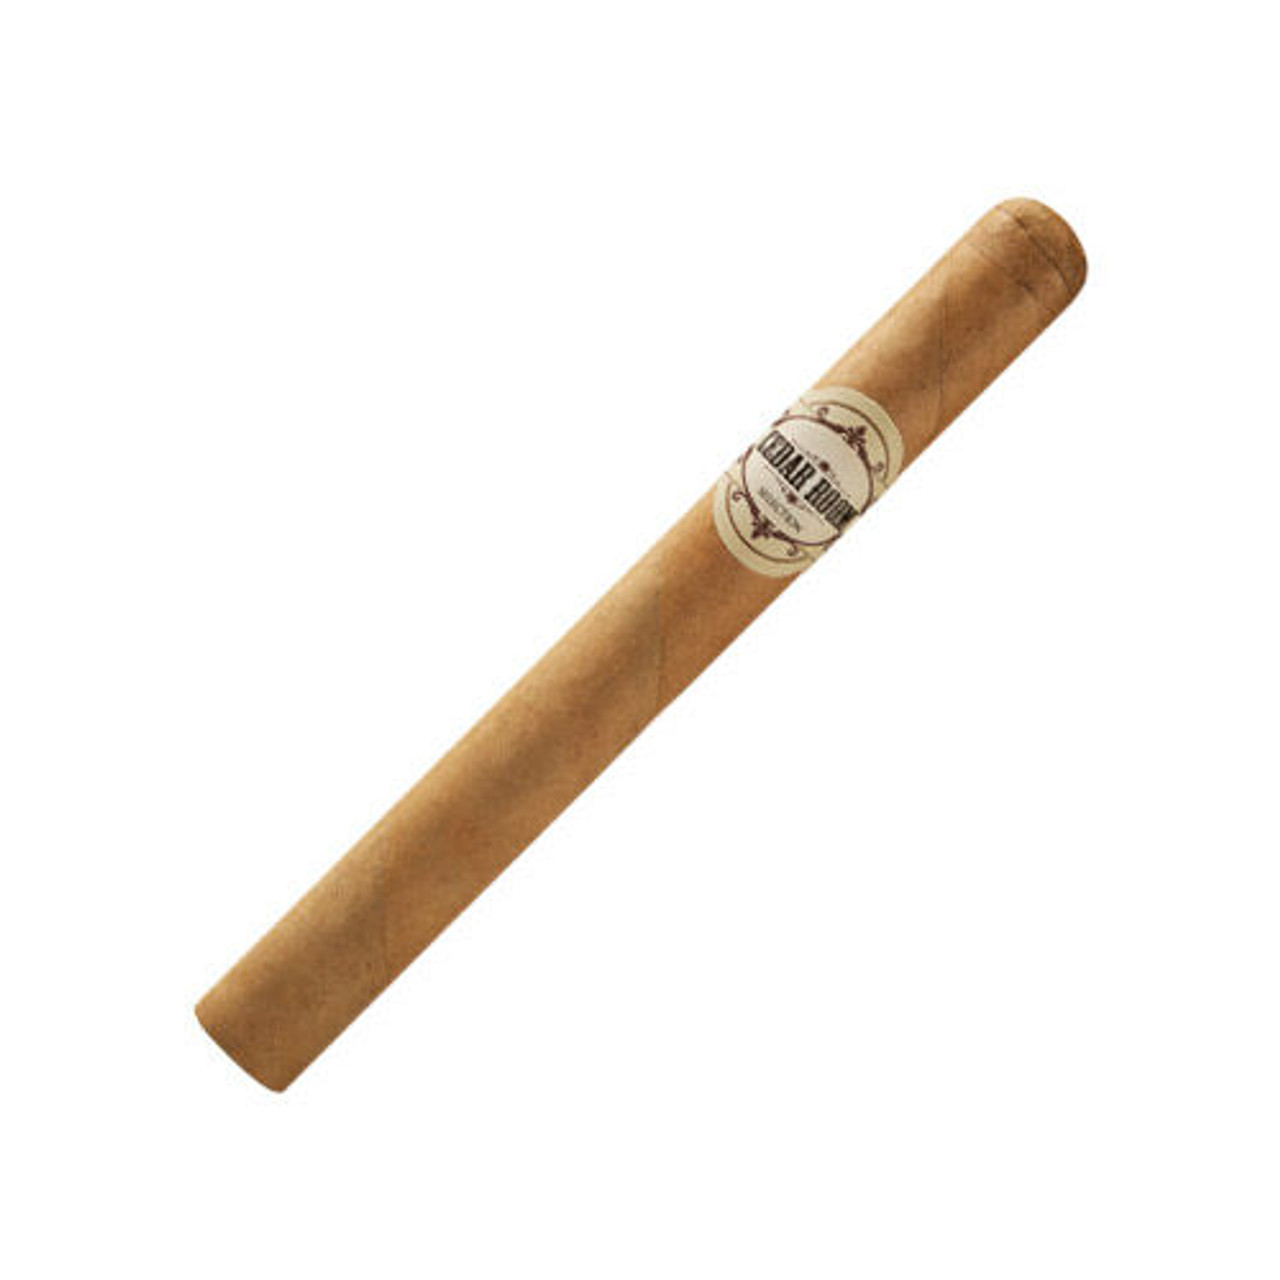 Cedar Room Short Panatela Cigars - 5 x 36 (Bundle of 20)